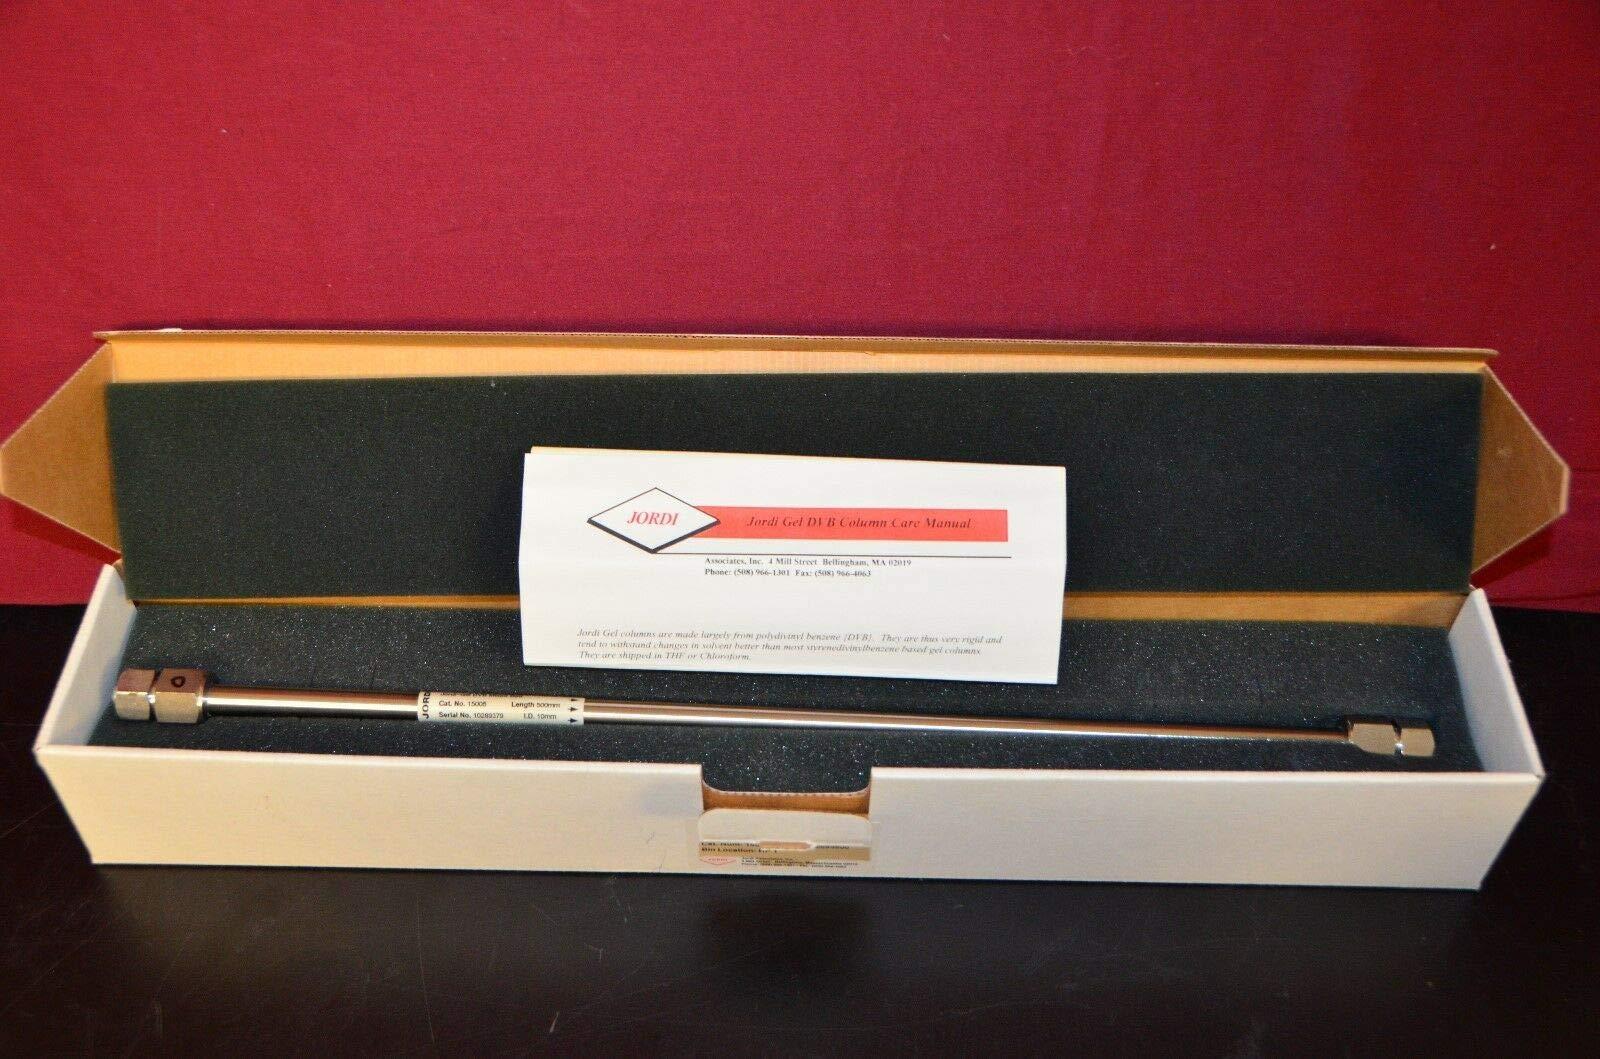 labtechsales Jordi Jordi-Gel DVB Mixed Bed 500mm x 10mm HPLC Column 15005